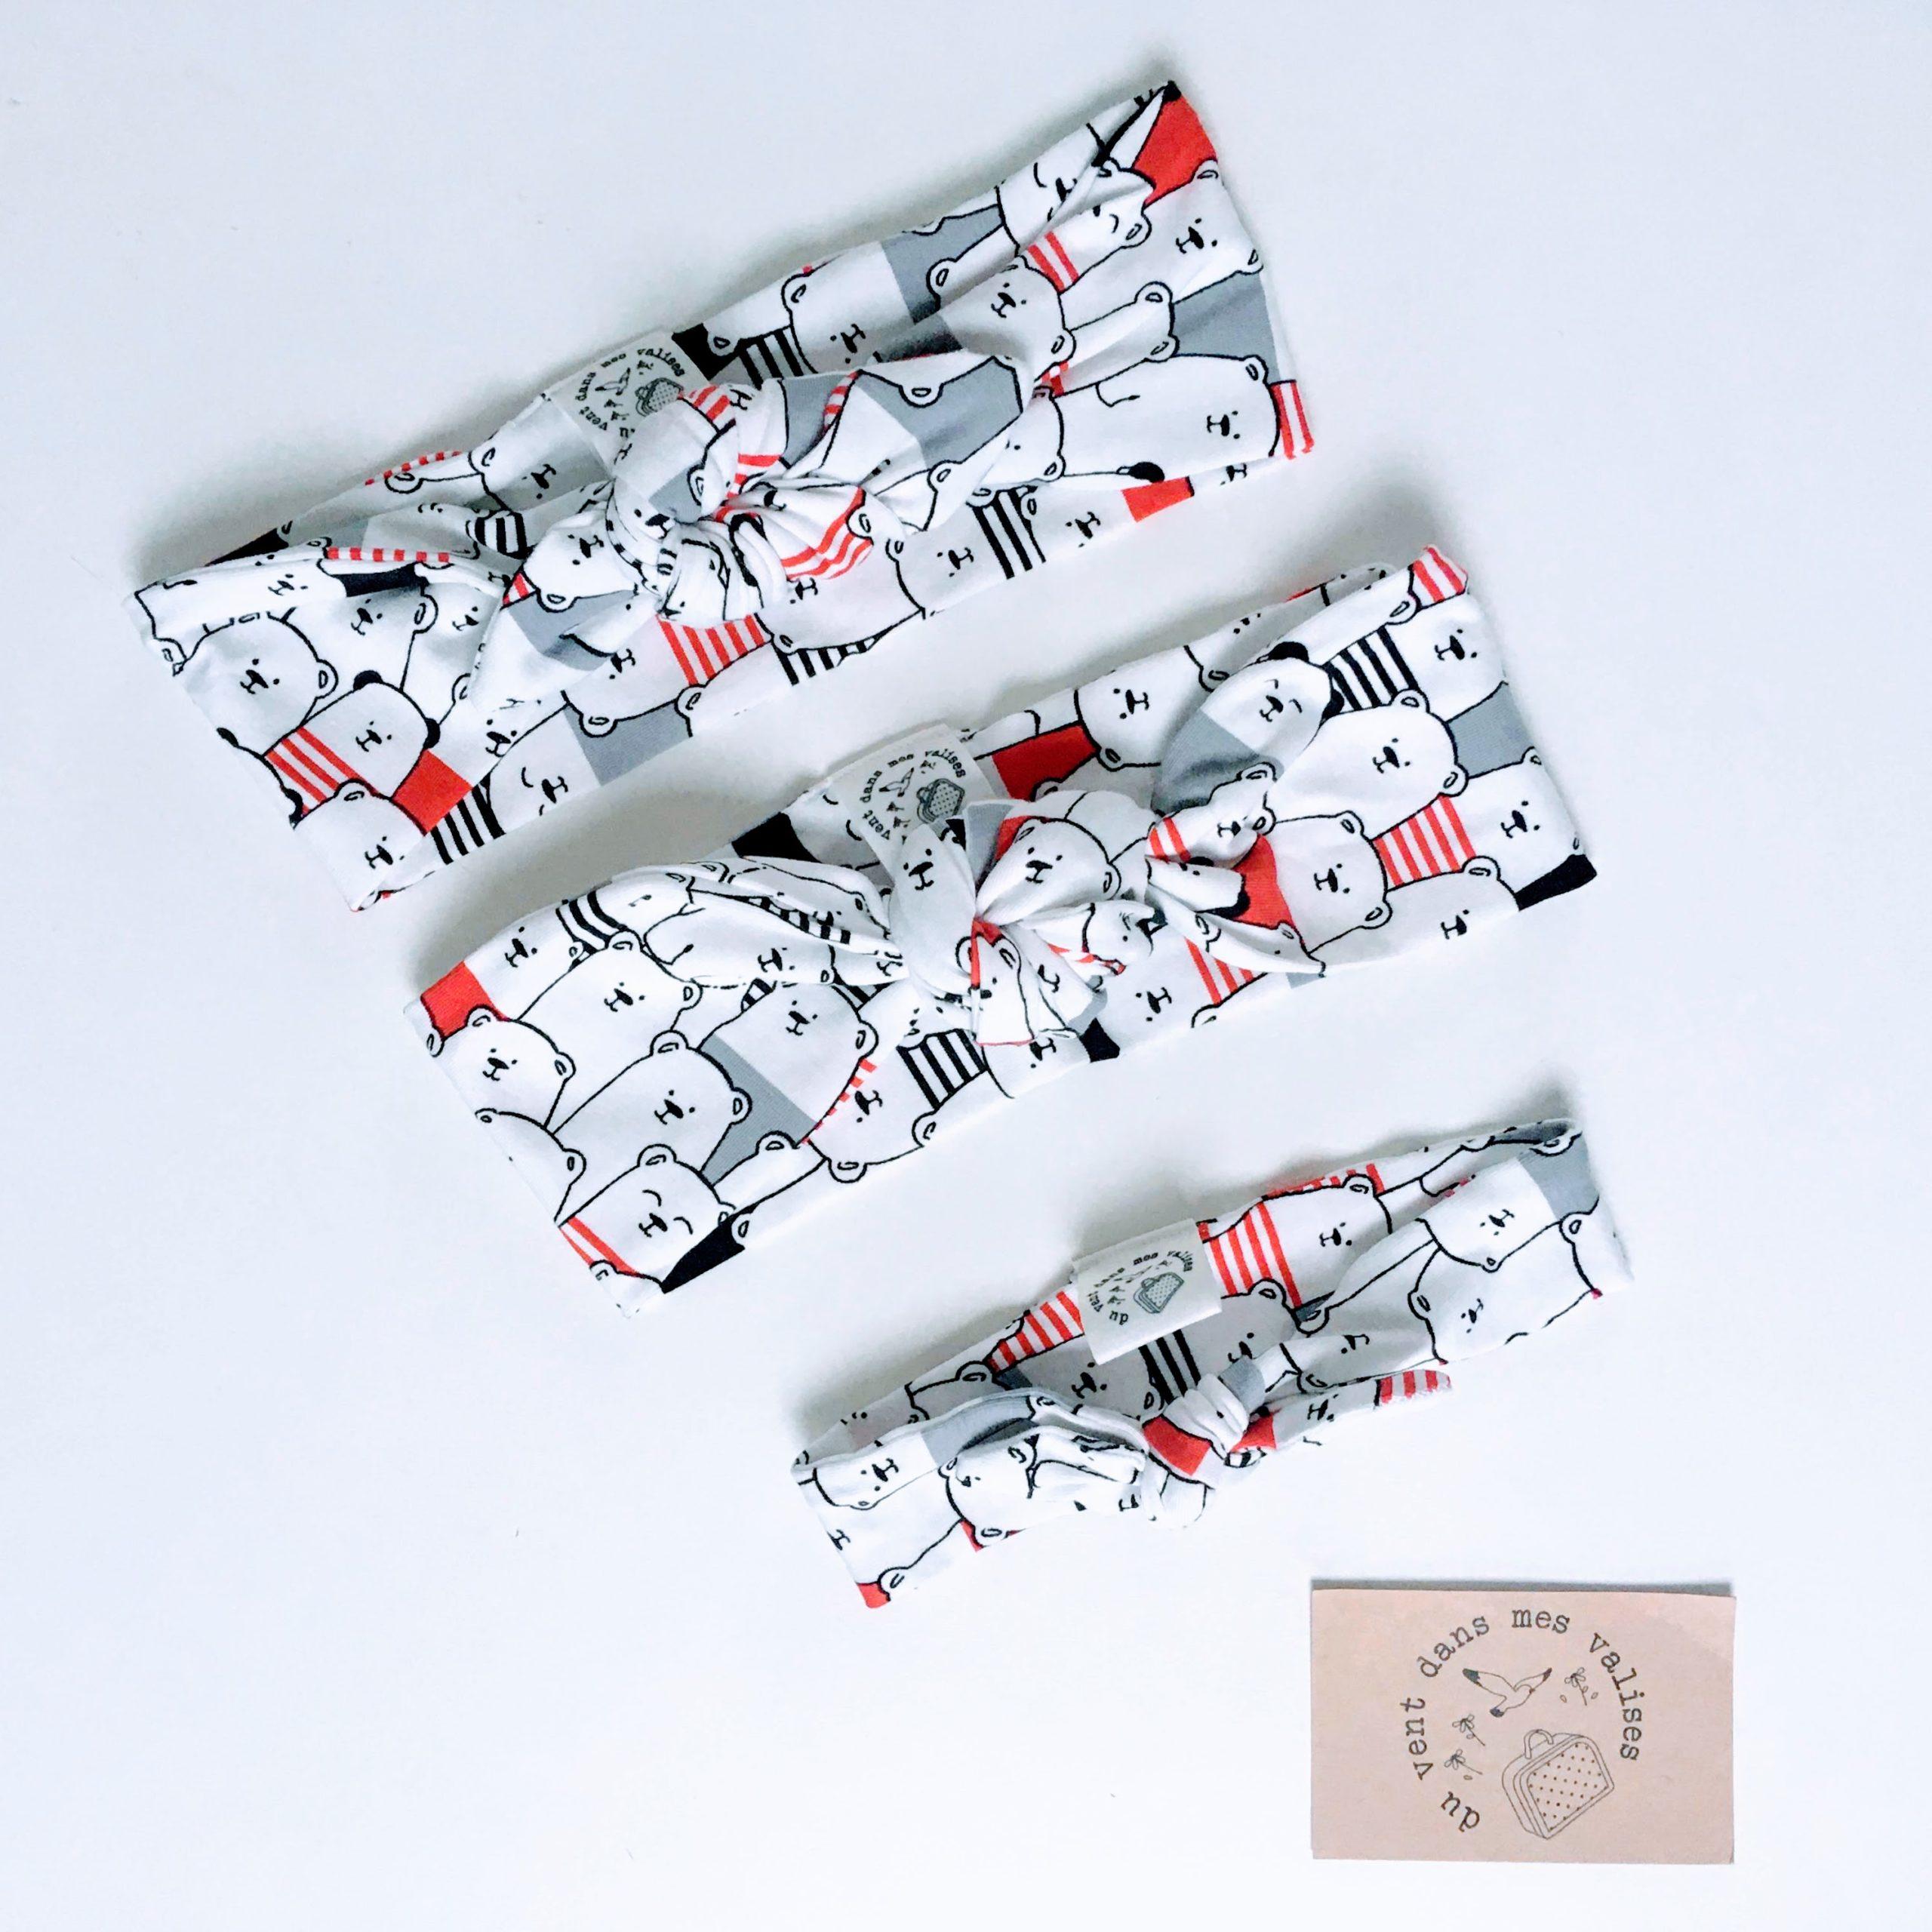 du vent dans mes valises - bandeau extensible enfant adulte jersey coton blanc ours marins made in France